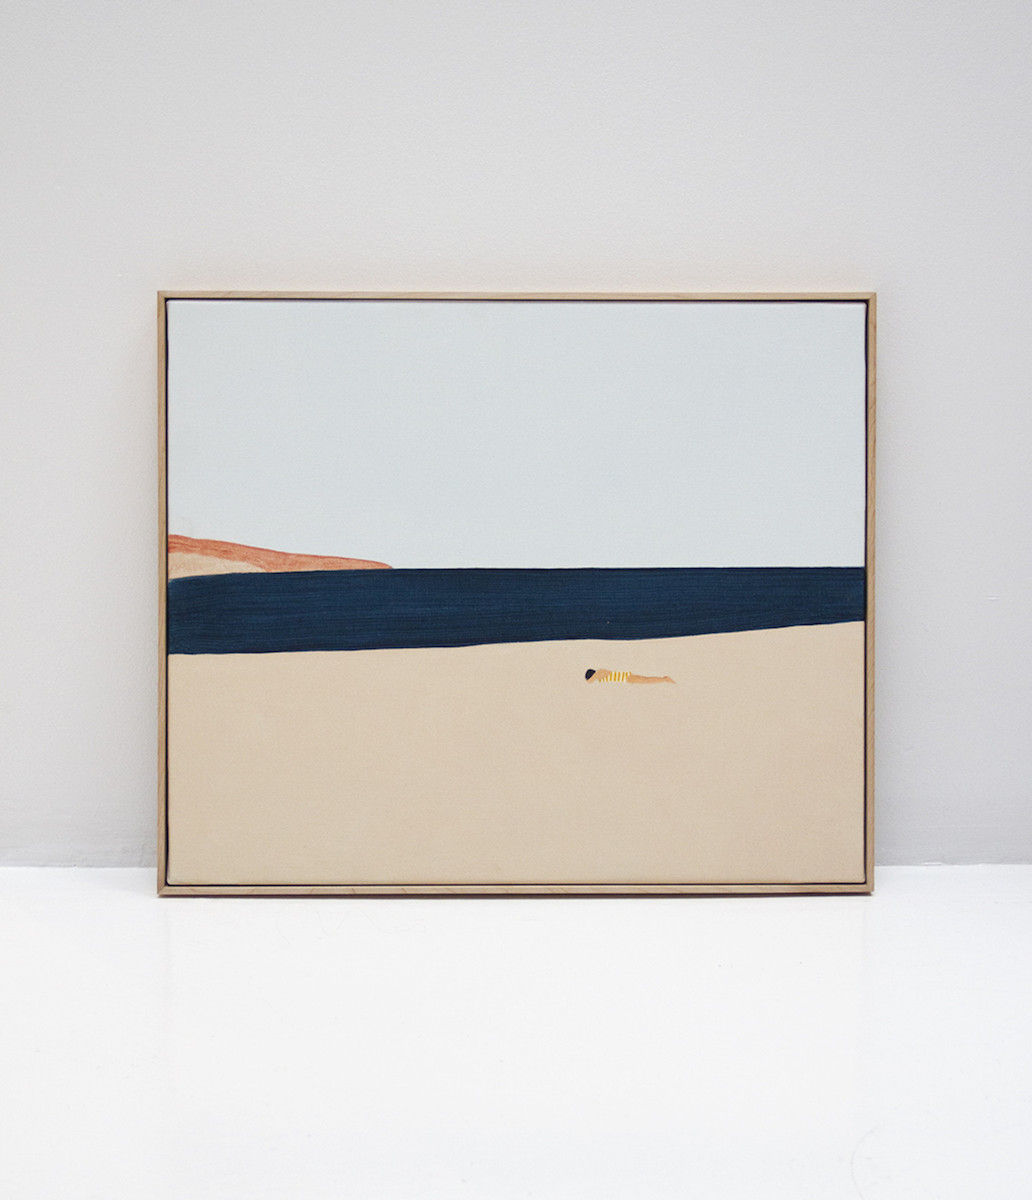 Guim Tió Zarraluki - La plajta, 2017 - Galeria Miquel Alzueta